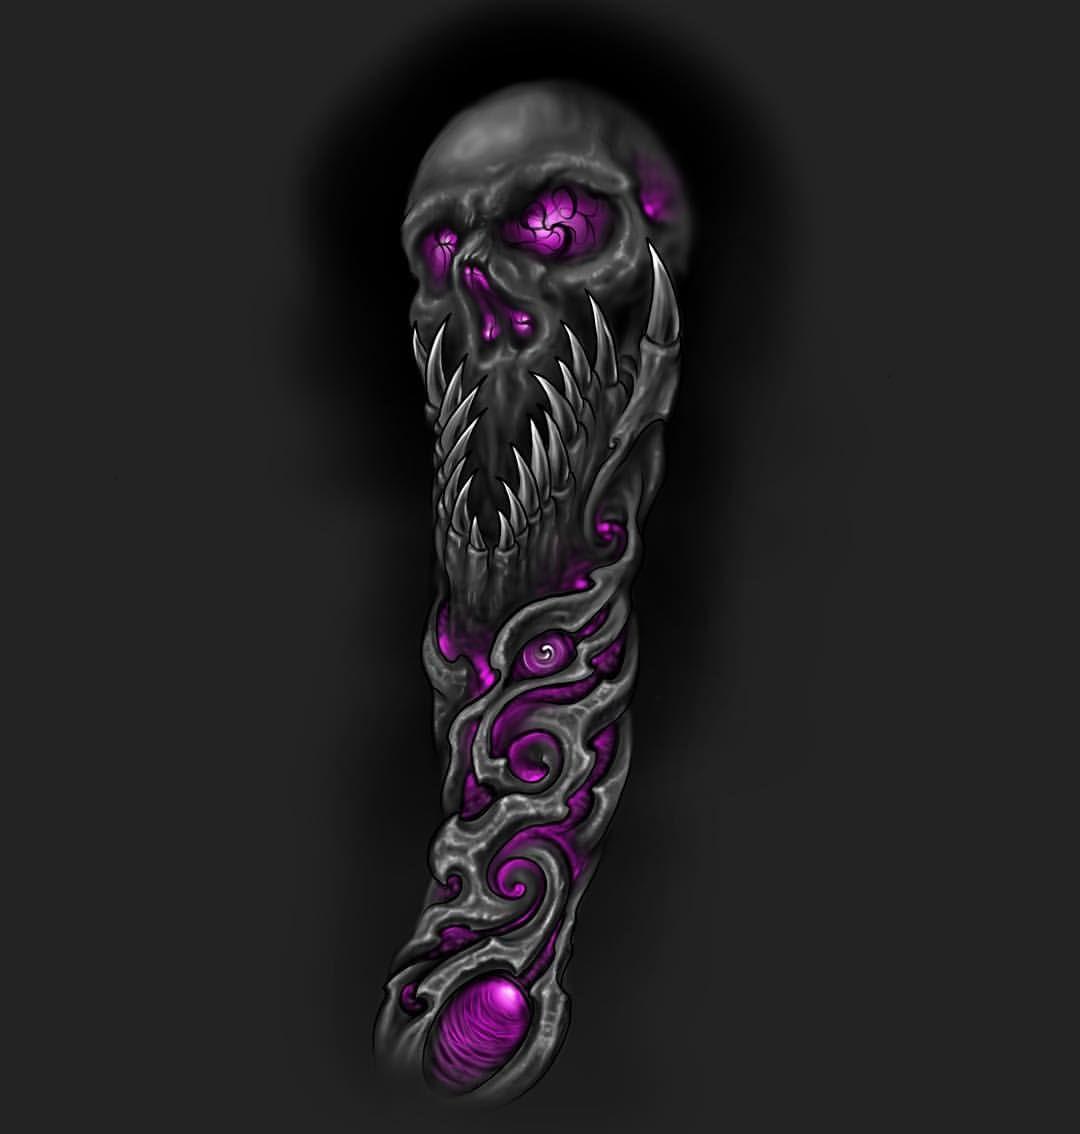 Skull Darkart Tattoo Saigontattooclub Design Drawing Biomechanical Biomech Binhp Skull Sleeve Tattoos Biomechanical Tattoo Biomechanical Tattoo Design